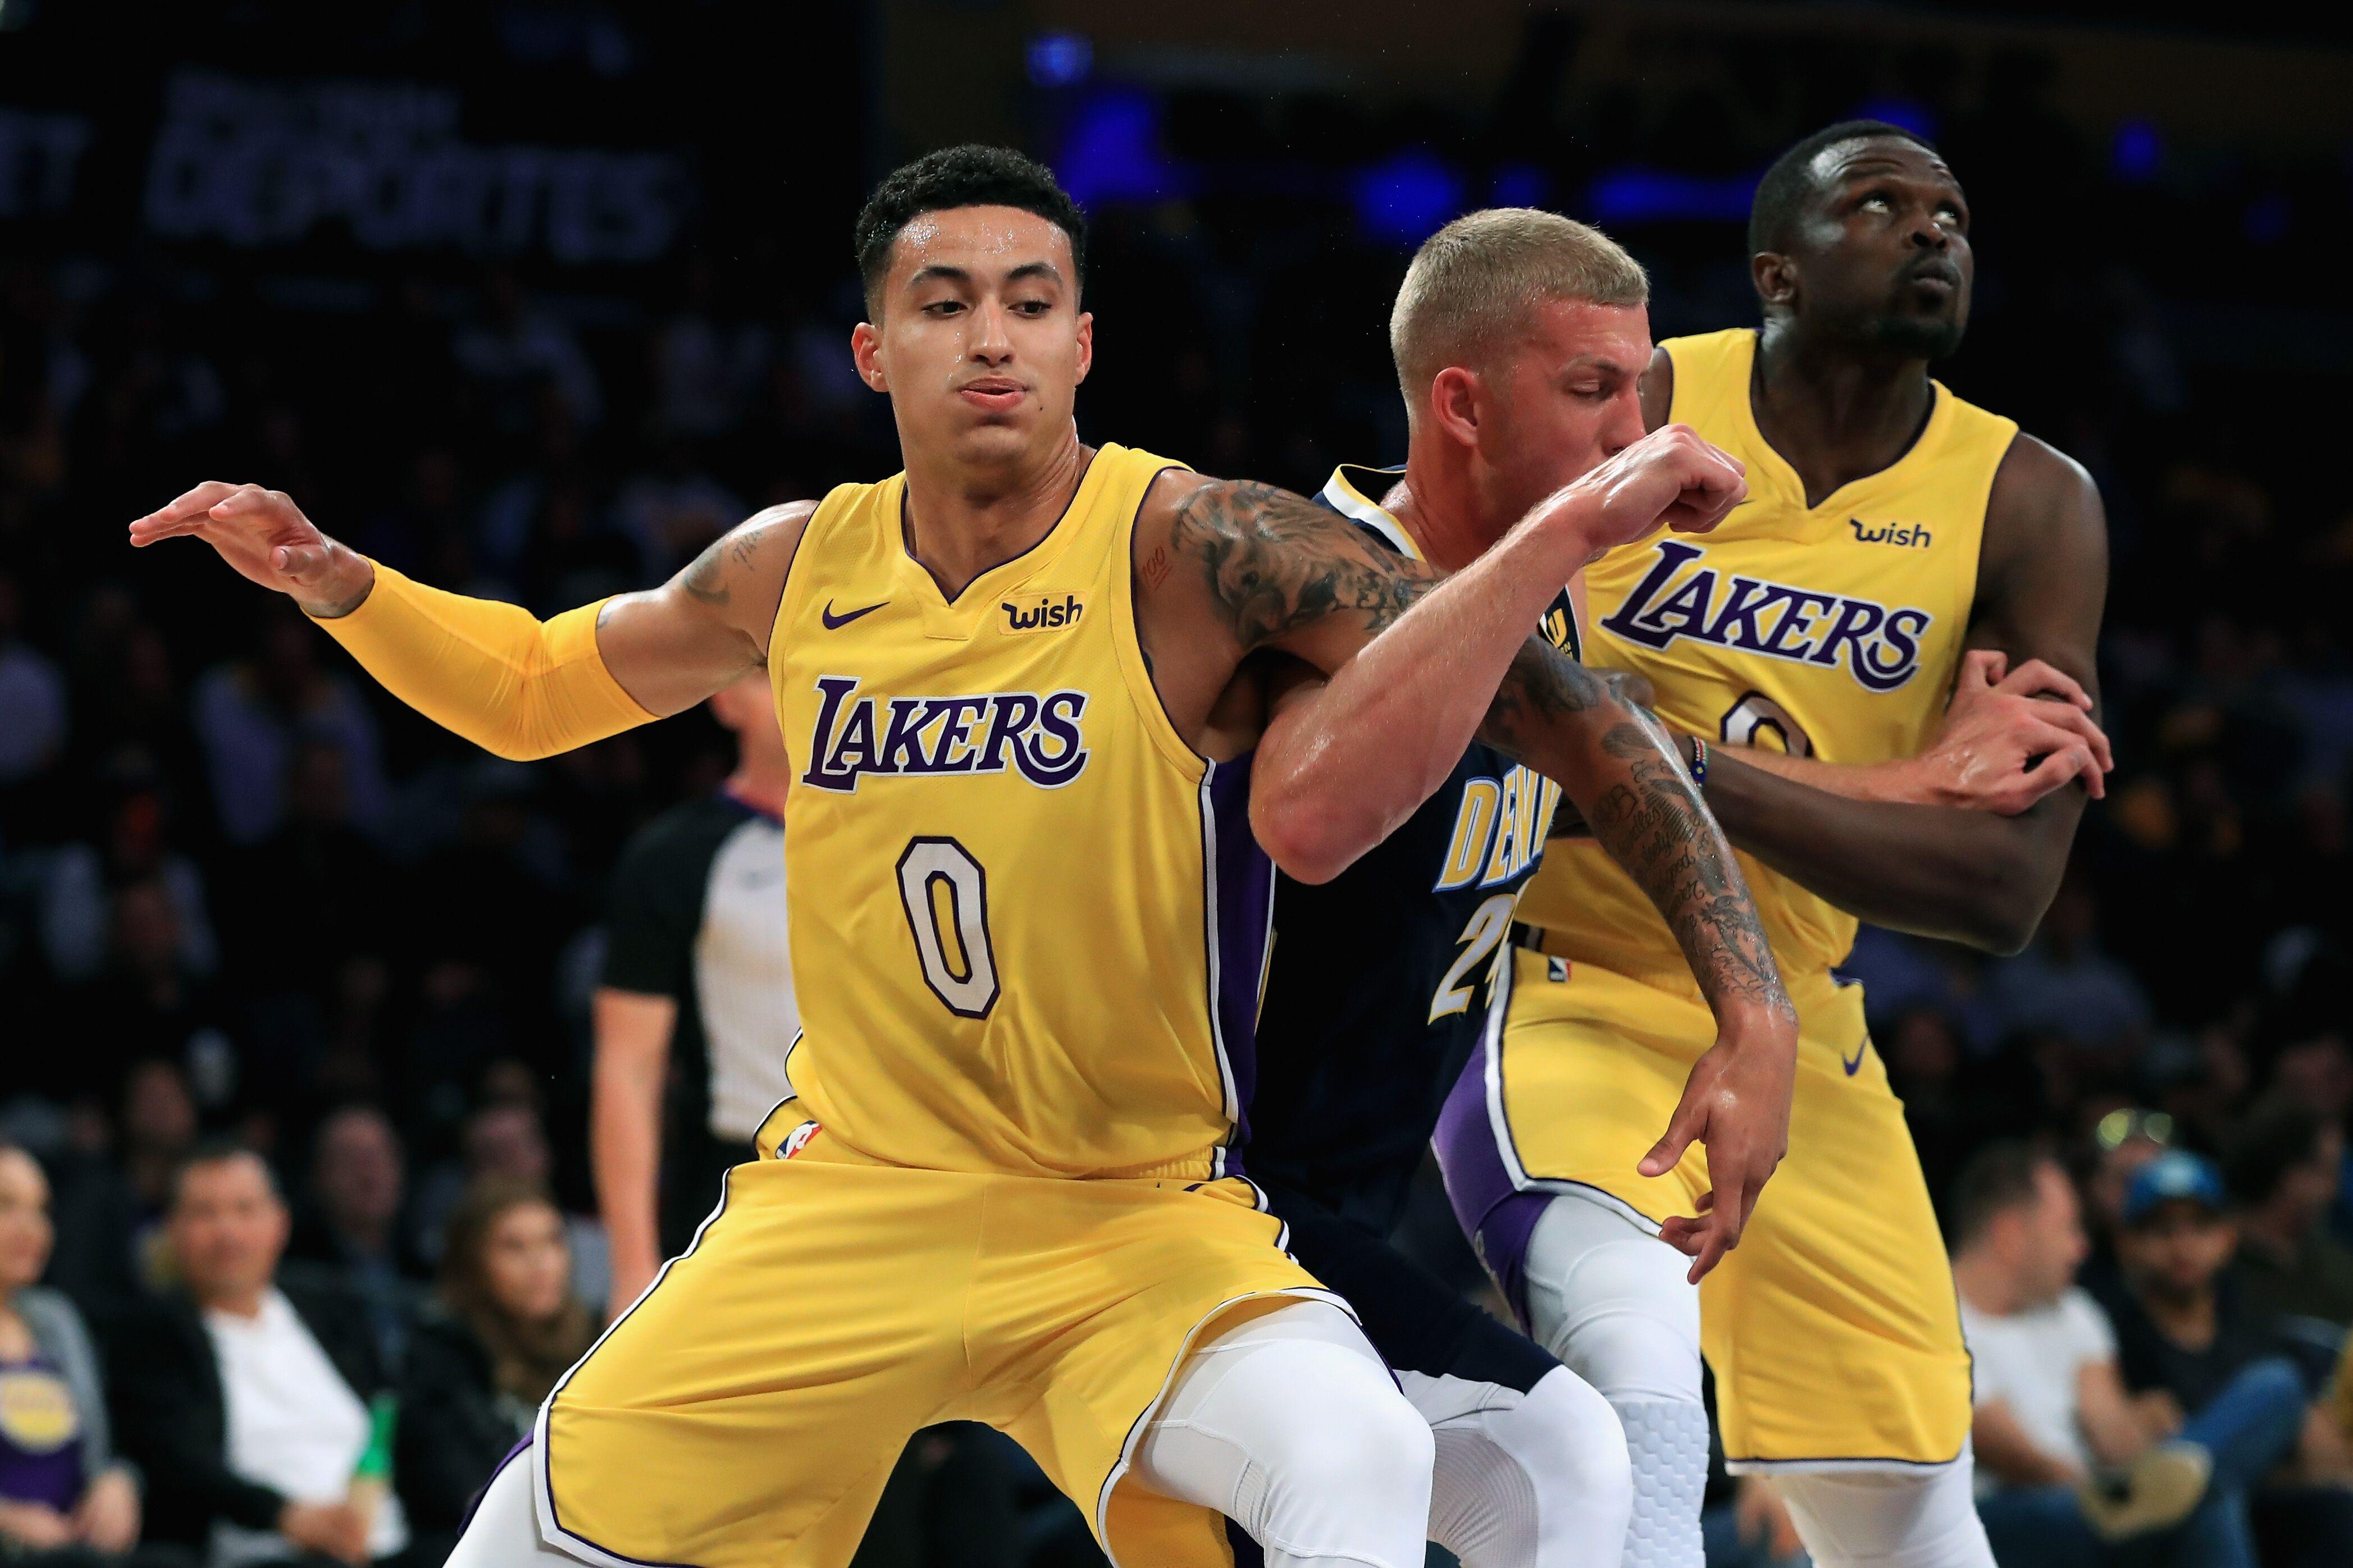 Los Angeles Lakers vs Denver Nuggets: How to watch NBA preseason online